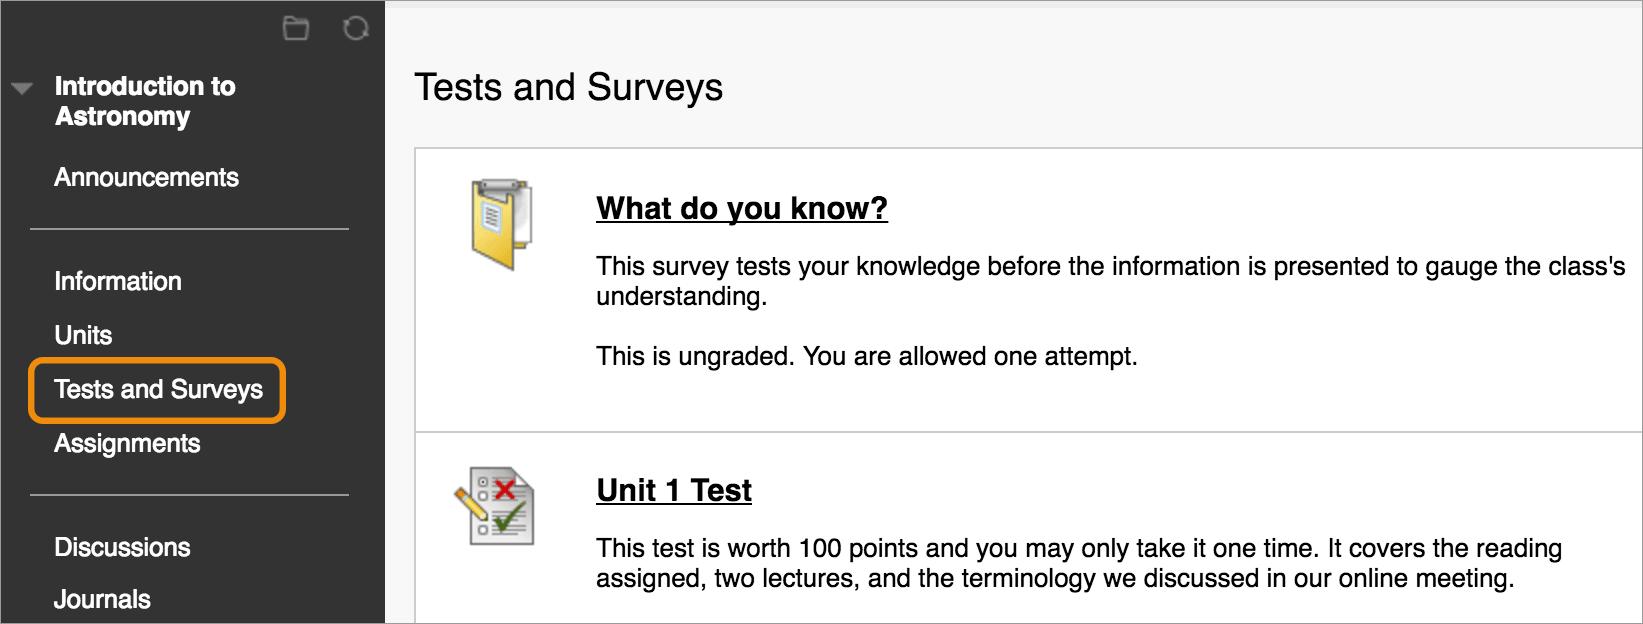 Where Do I Access Tests And Surveys?